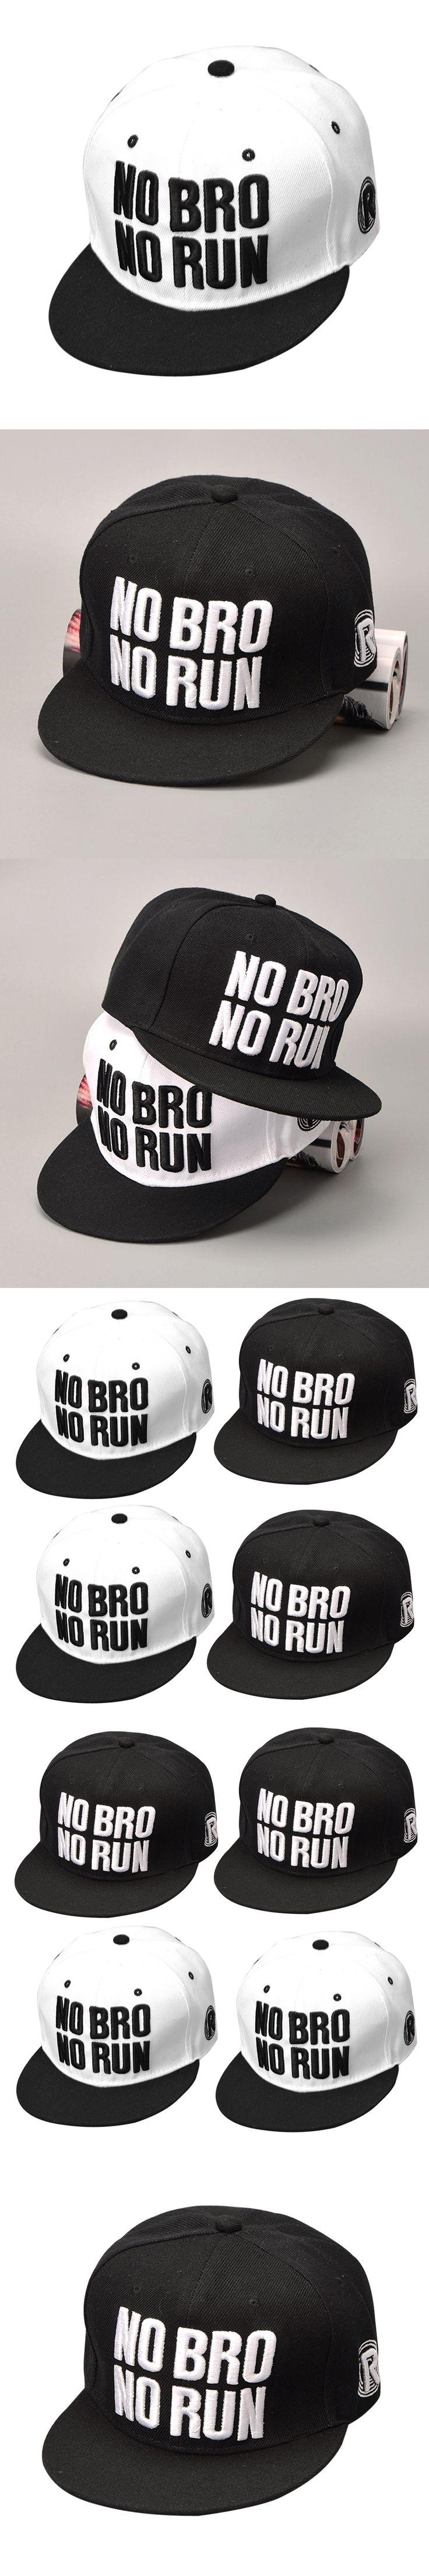 New Fashion Snapback Unisex Baseball Cap Letter Print Flat-Brimmed Hat Visor Hat Wild Personality Hip Hop Hats For Men Women